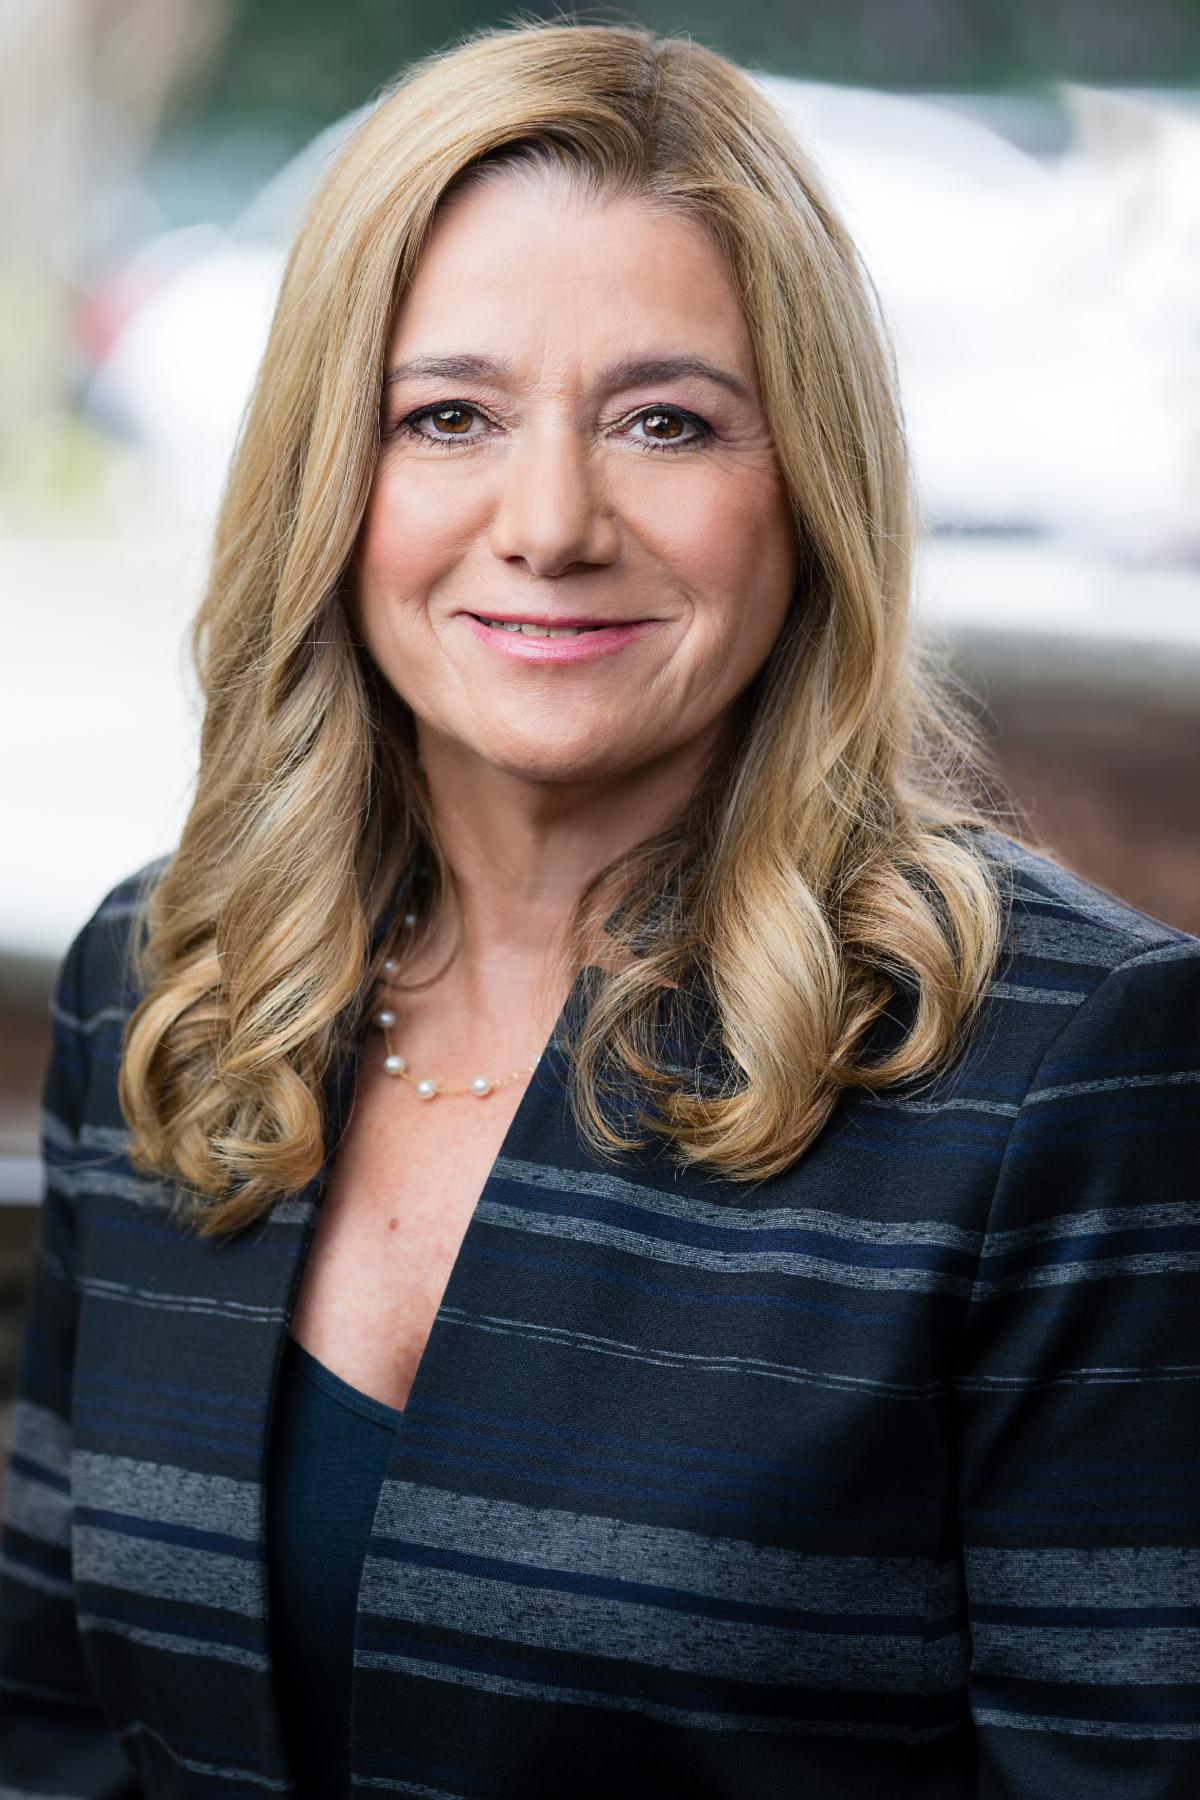 Annamarie Bondi-StoddardAnnual Health Law Colloquium